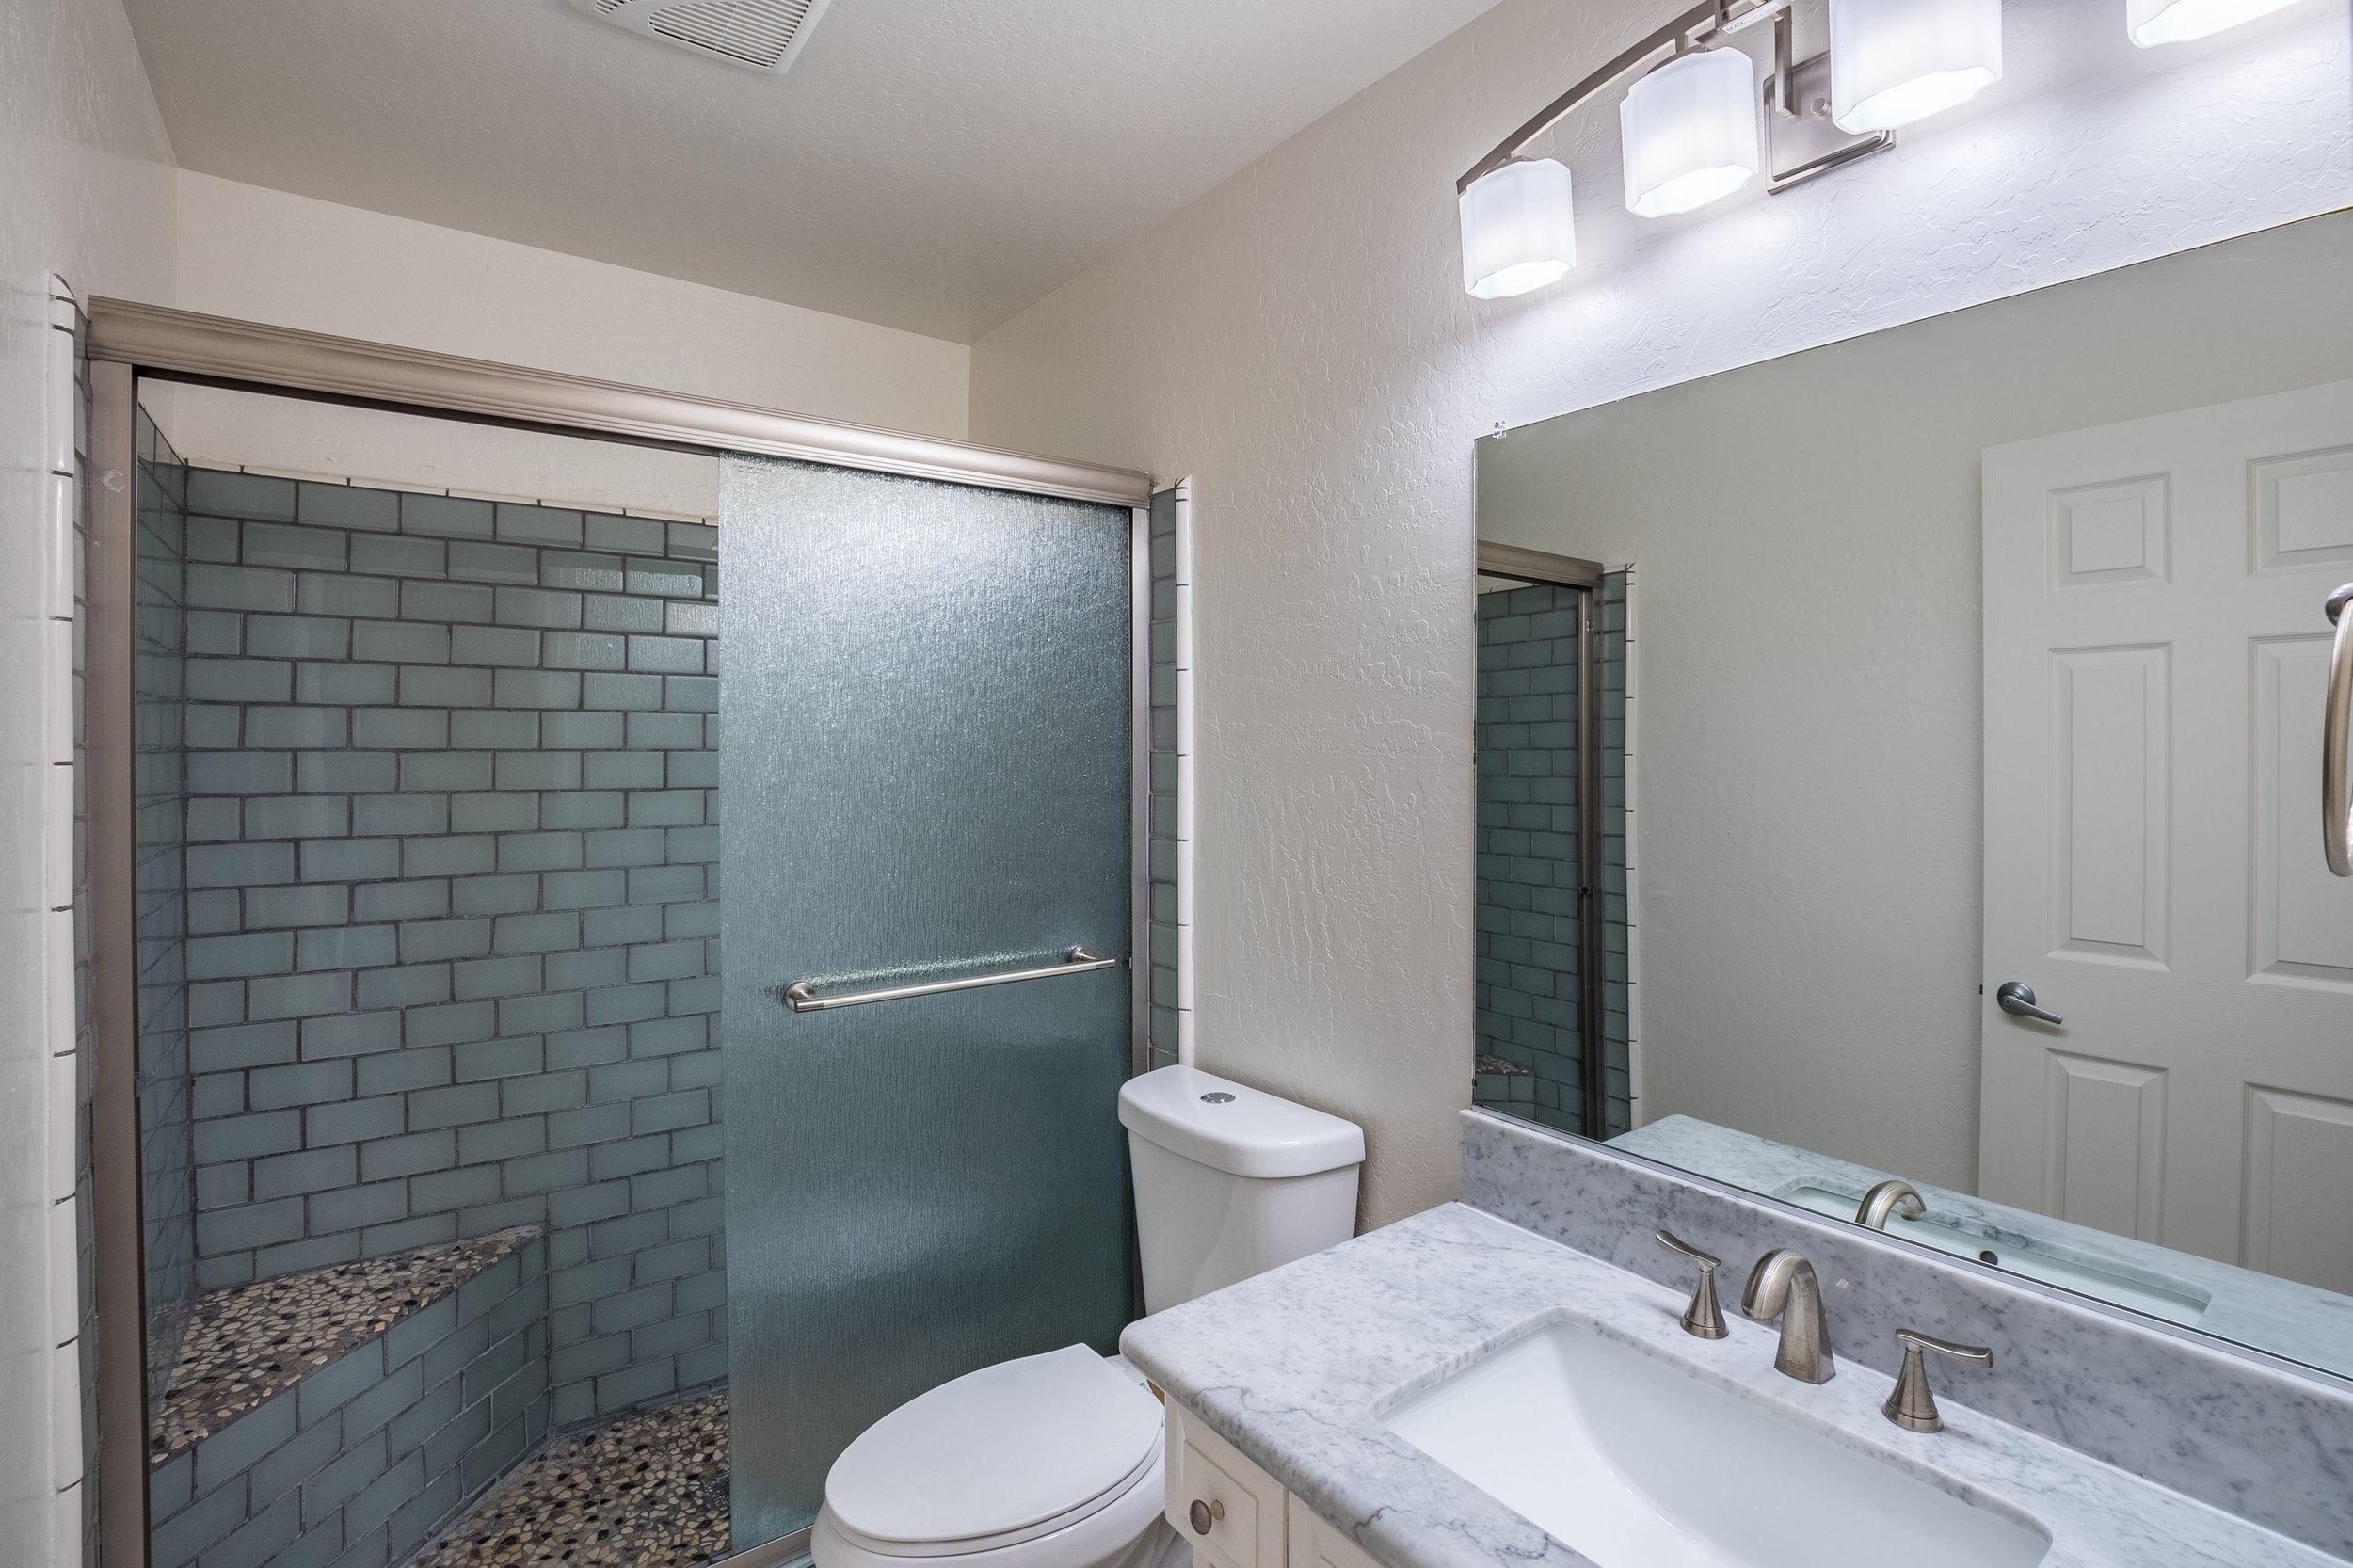 Updated Bathroom in 3 Bedroom 2 Bathroom Condo in Aptos